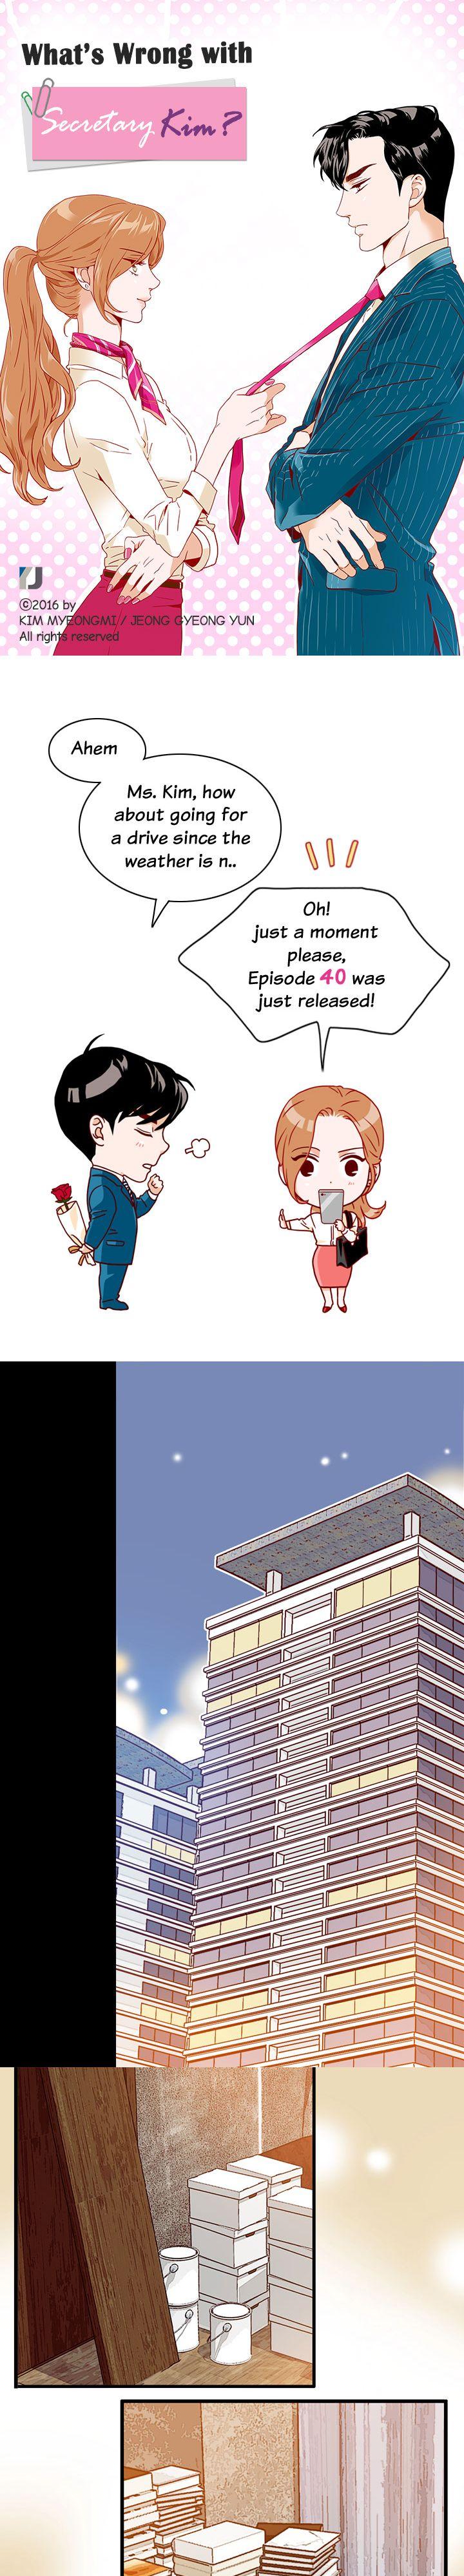 https://manga.mangadogs.com/comics/pic2/15/25807/960697/8af7aa91dea57ef40a8a11afea500470.jpg Page 1